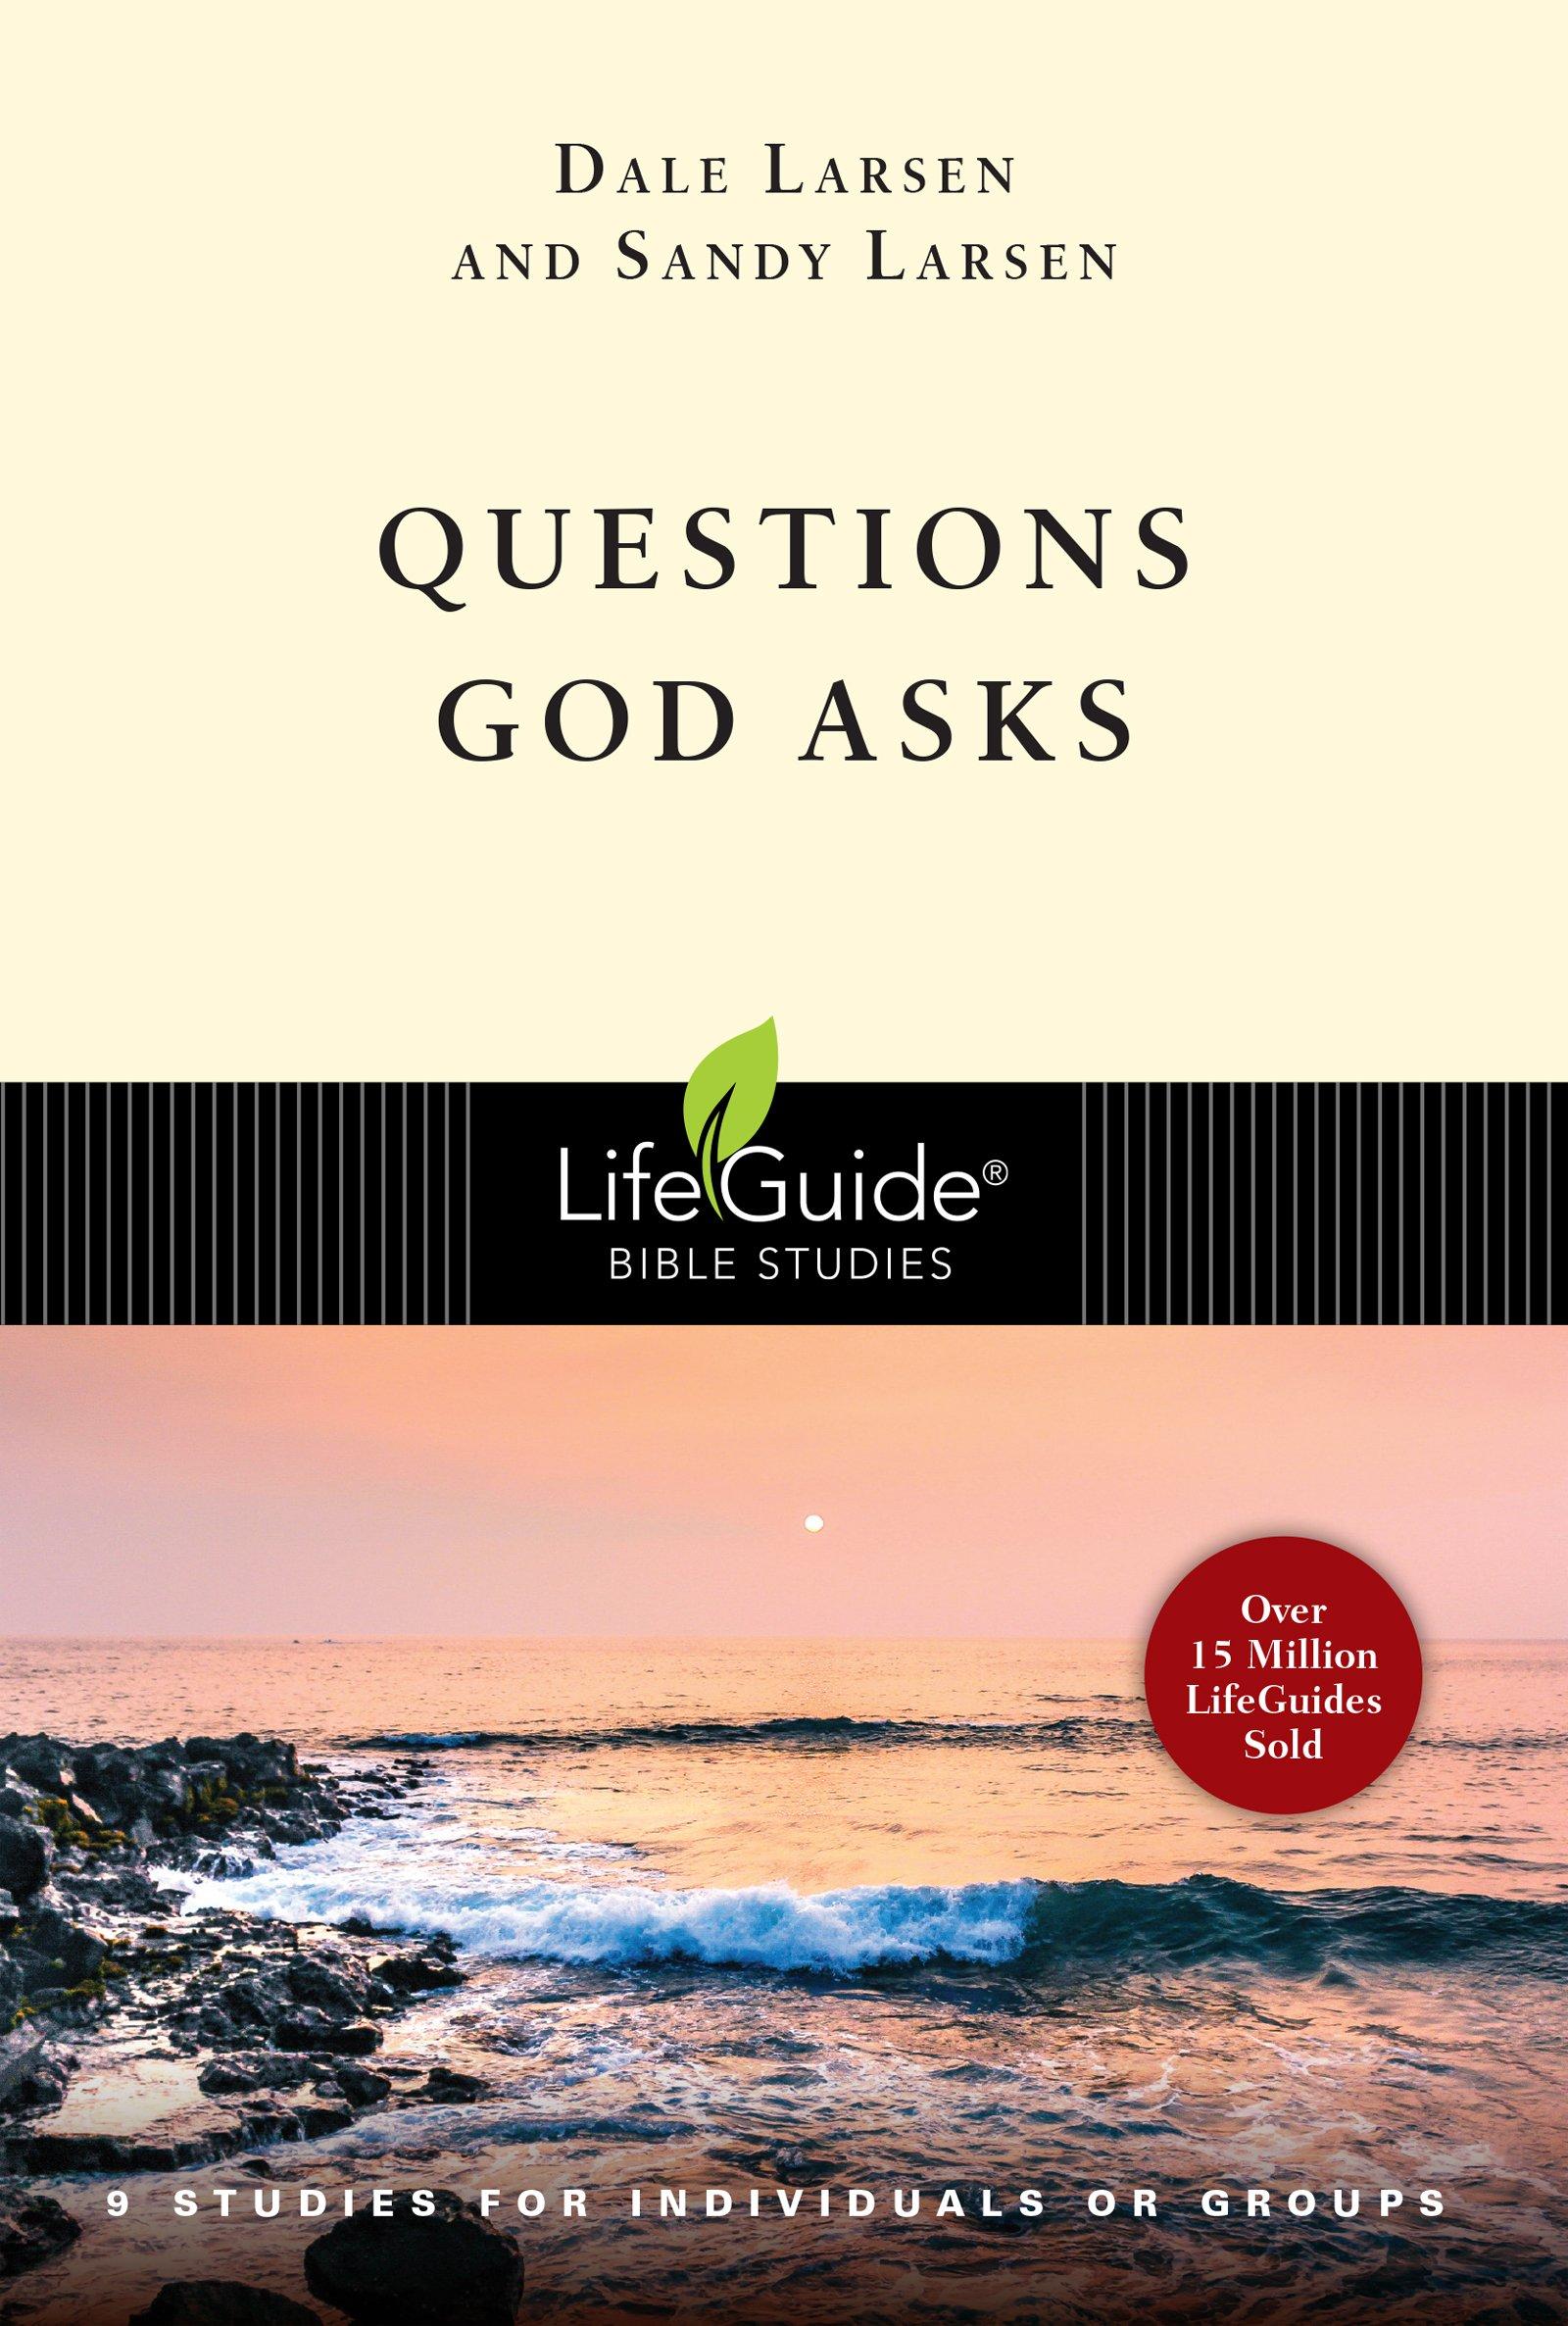 Download Questions God Asks (Lifeguide Bible Studies) pdf